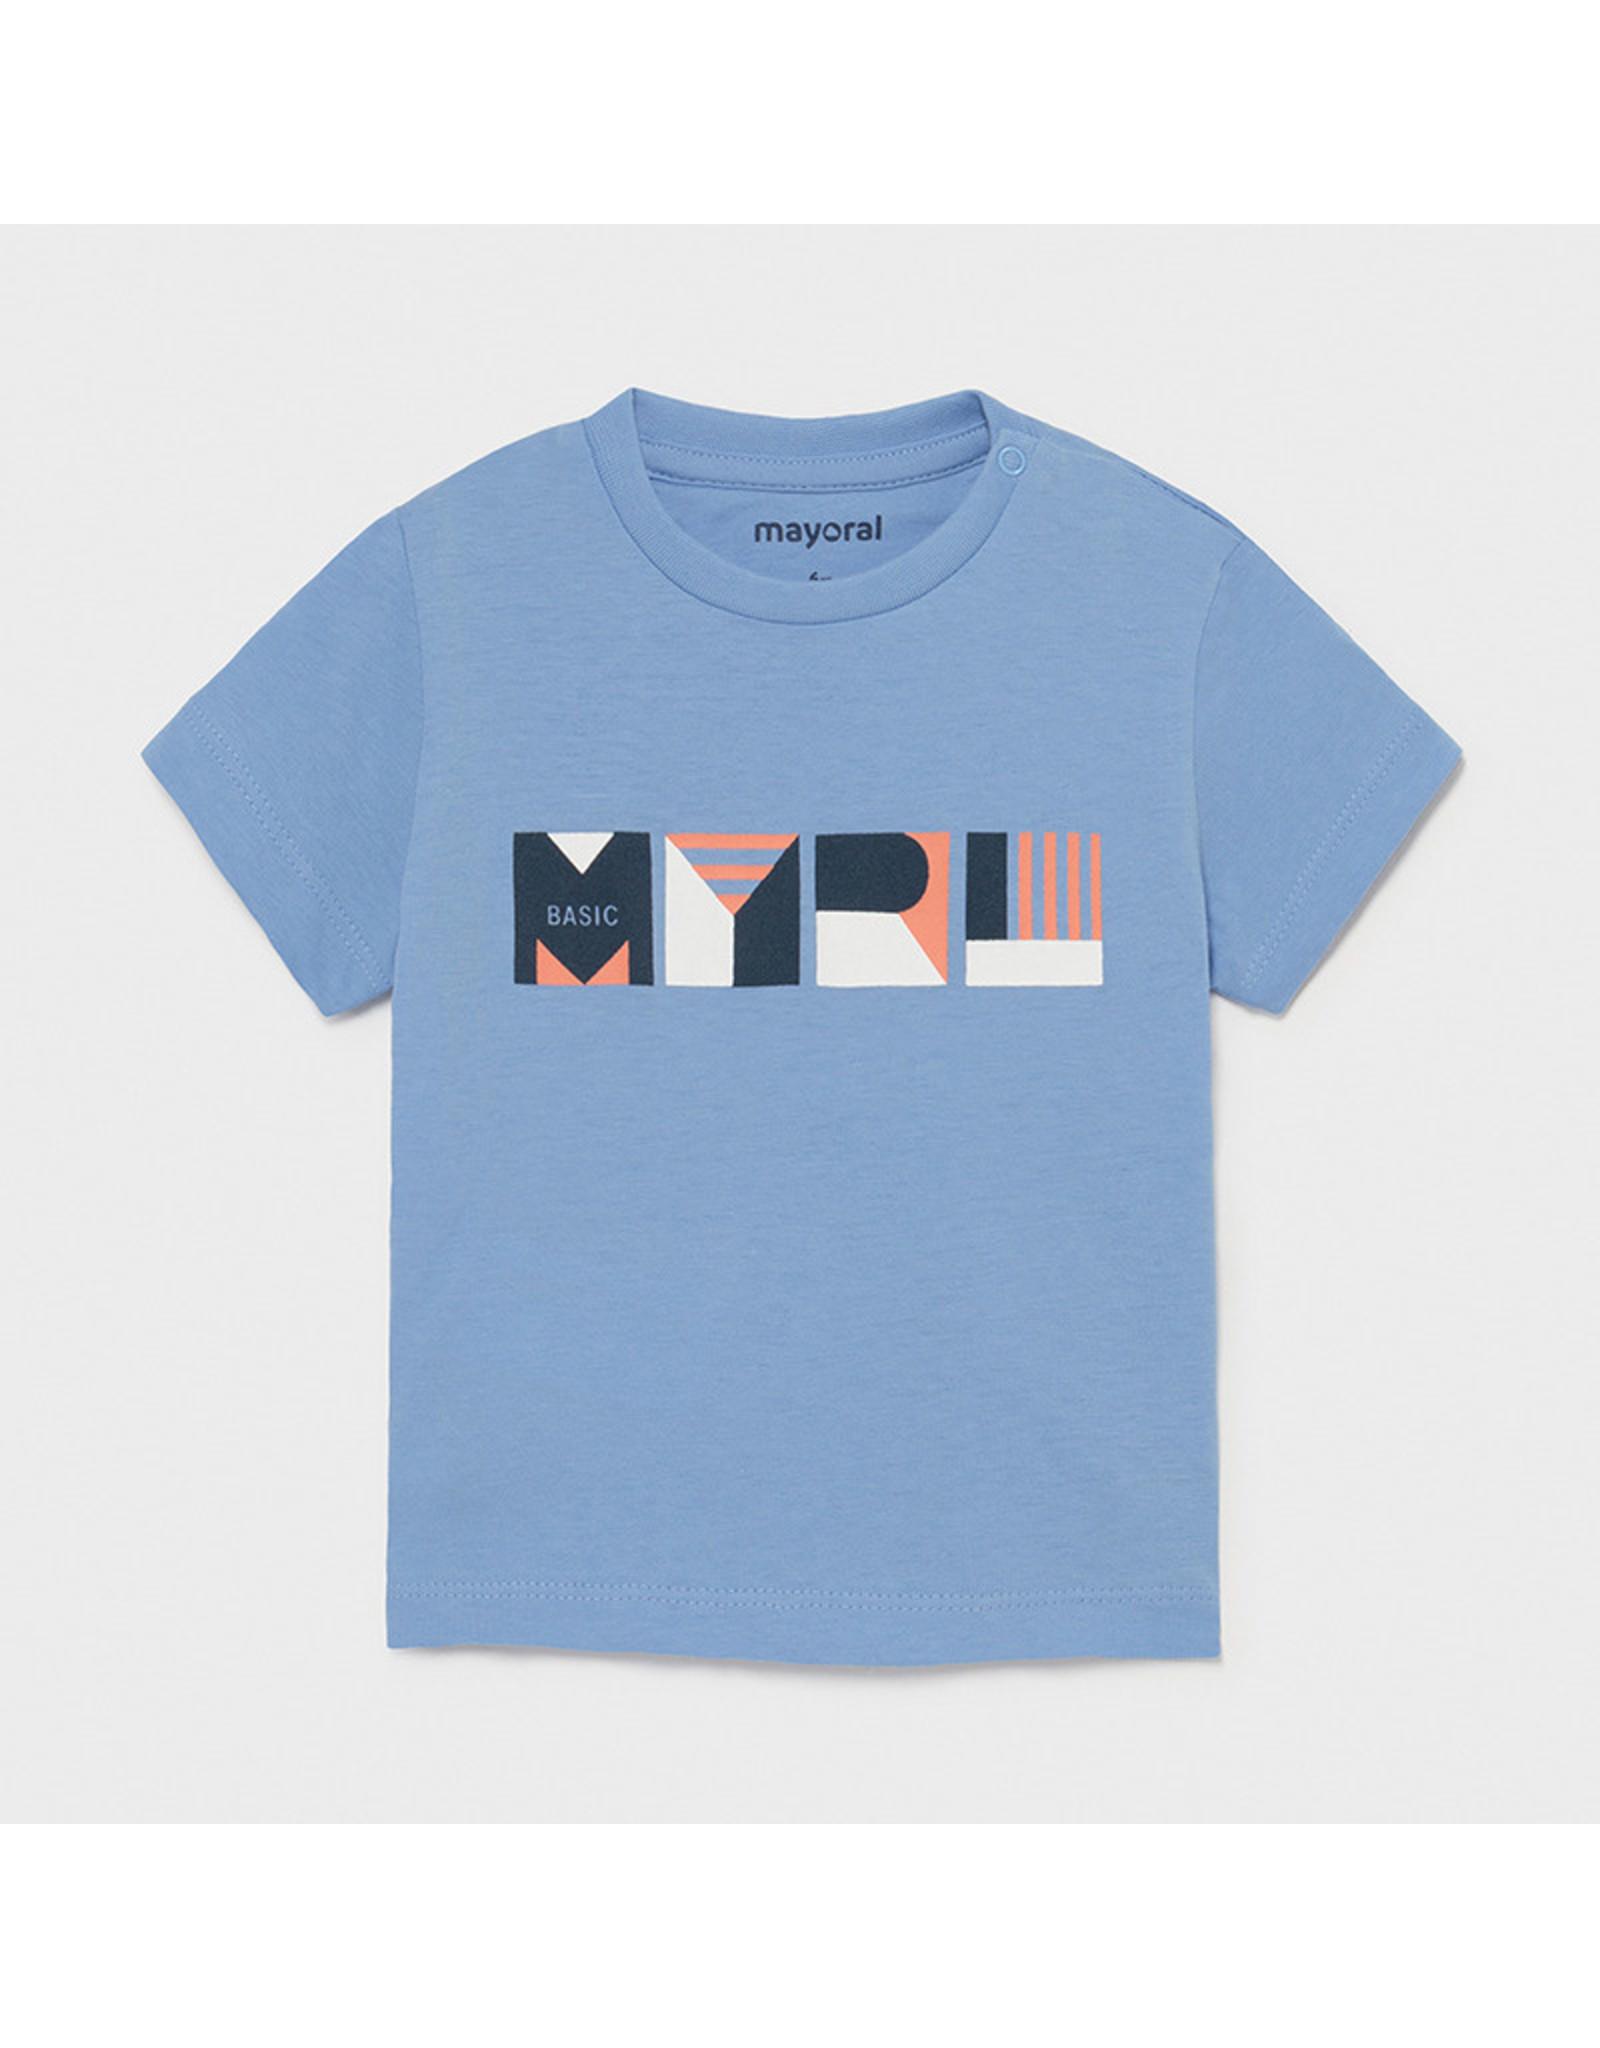 Mayoral Basic s/s t-shirt  Lavender